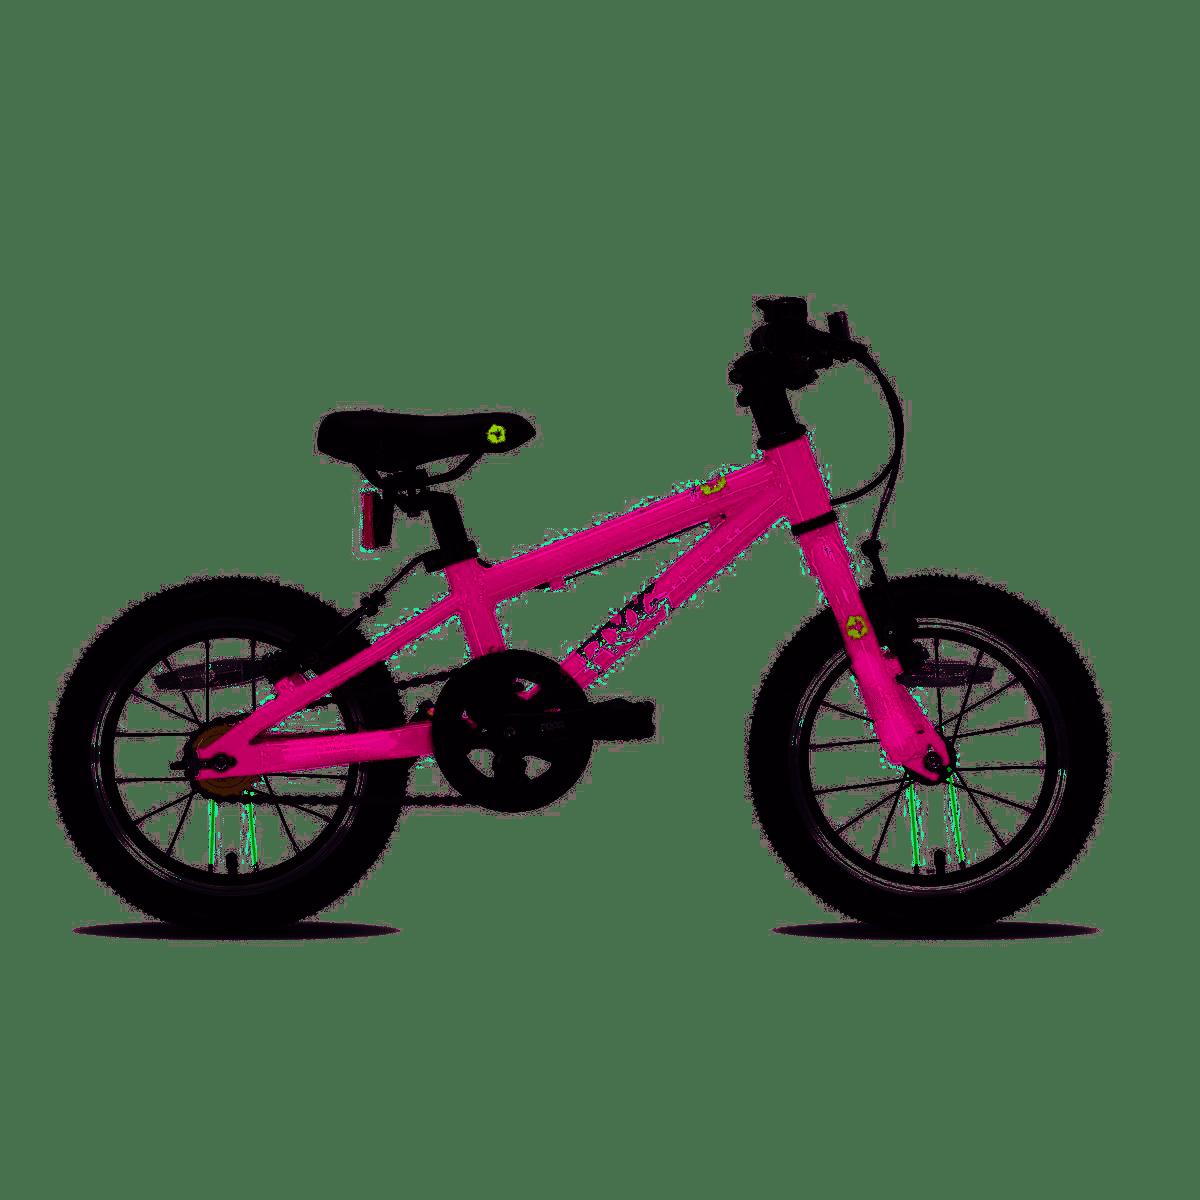 Frog 44 - Pink